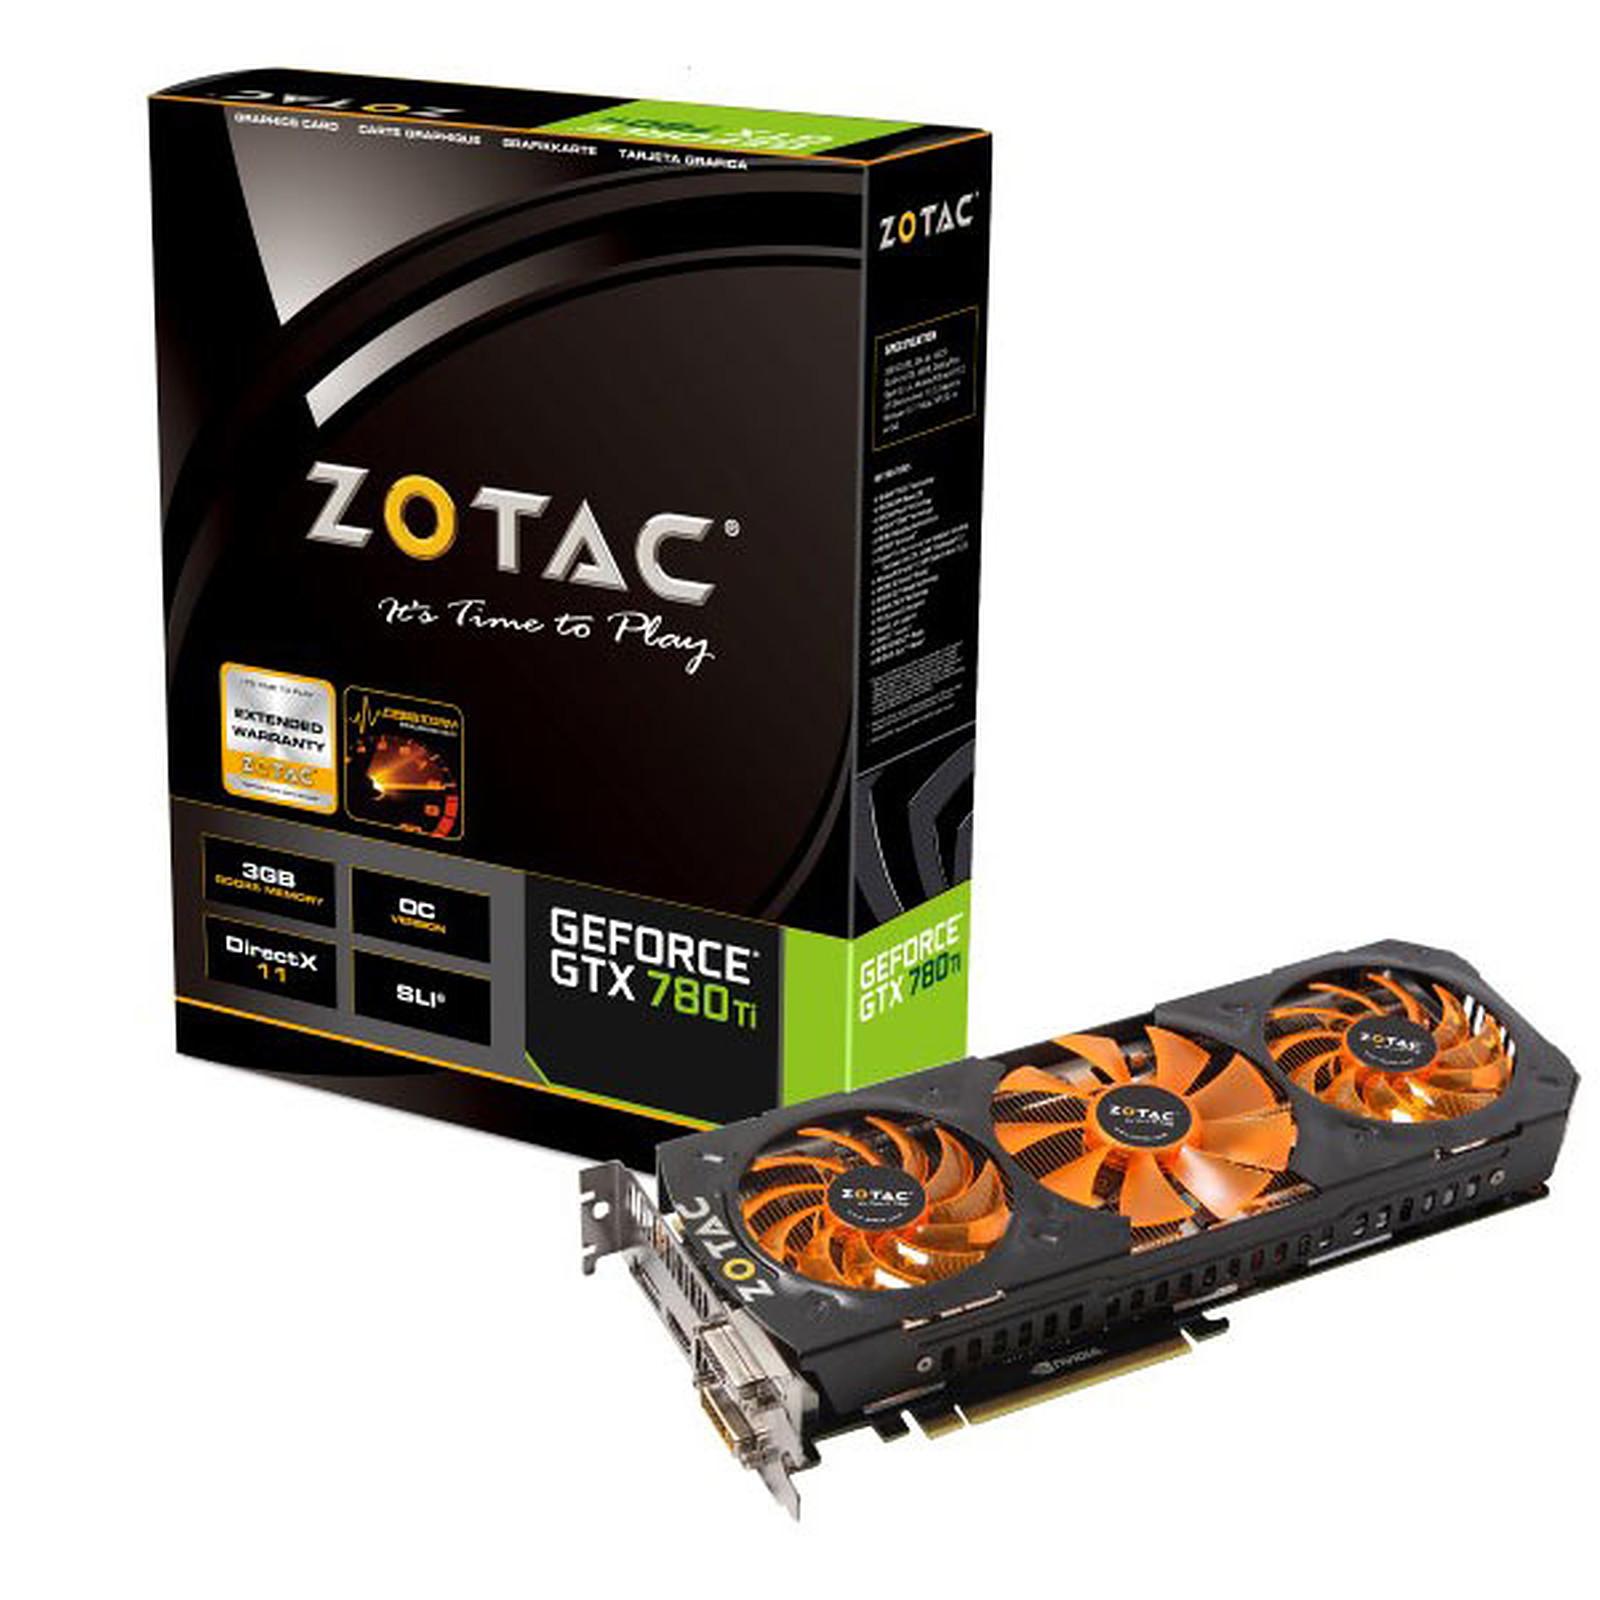 ZOTAC GeForce GTX 780 Ti OC 3GB